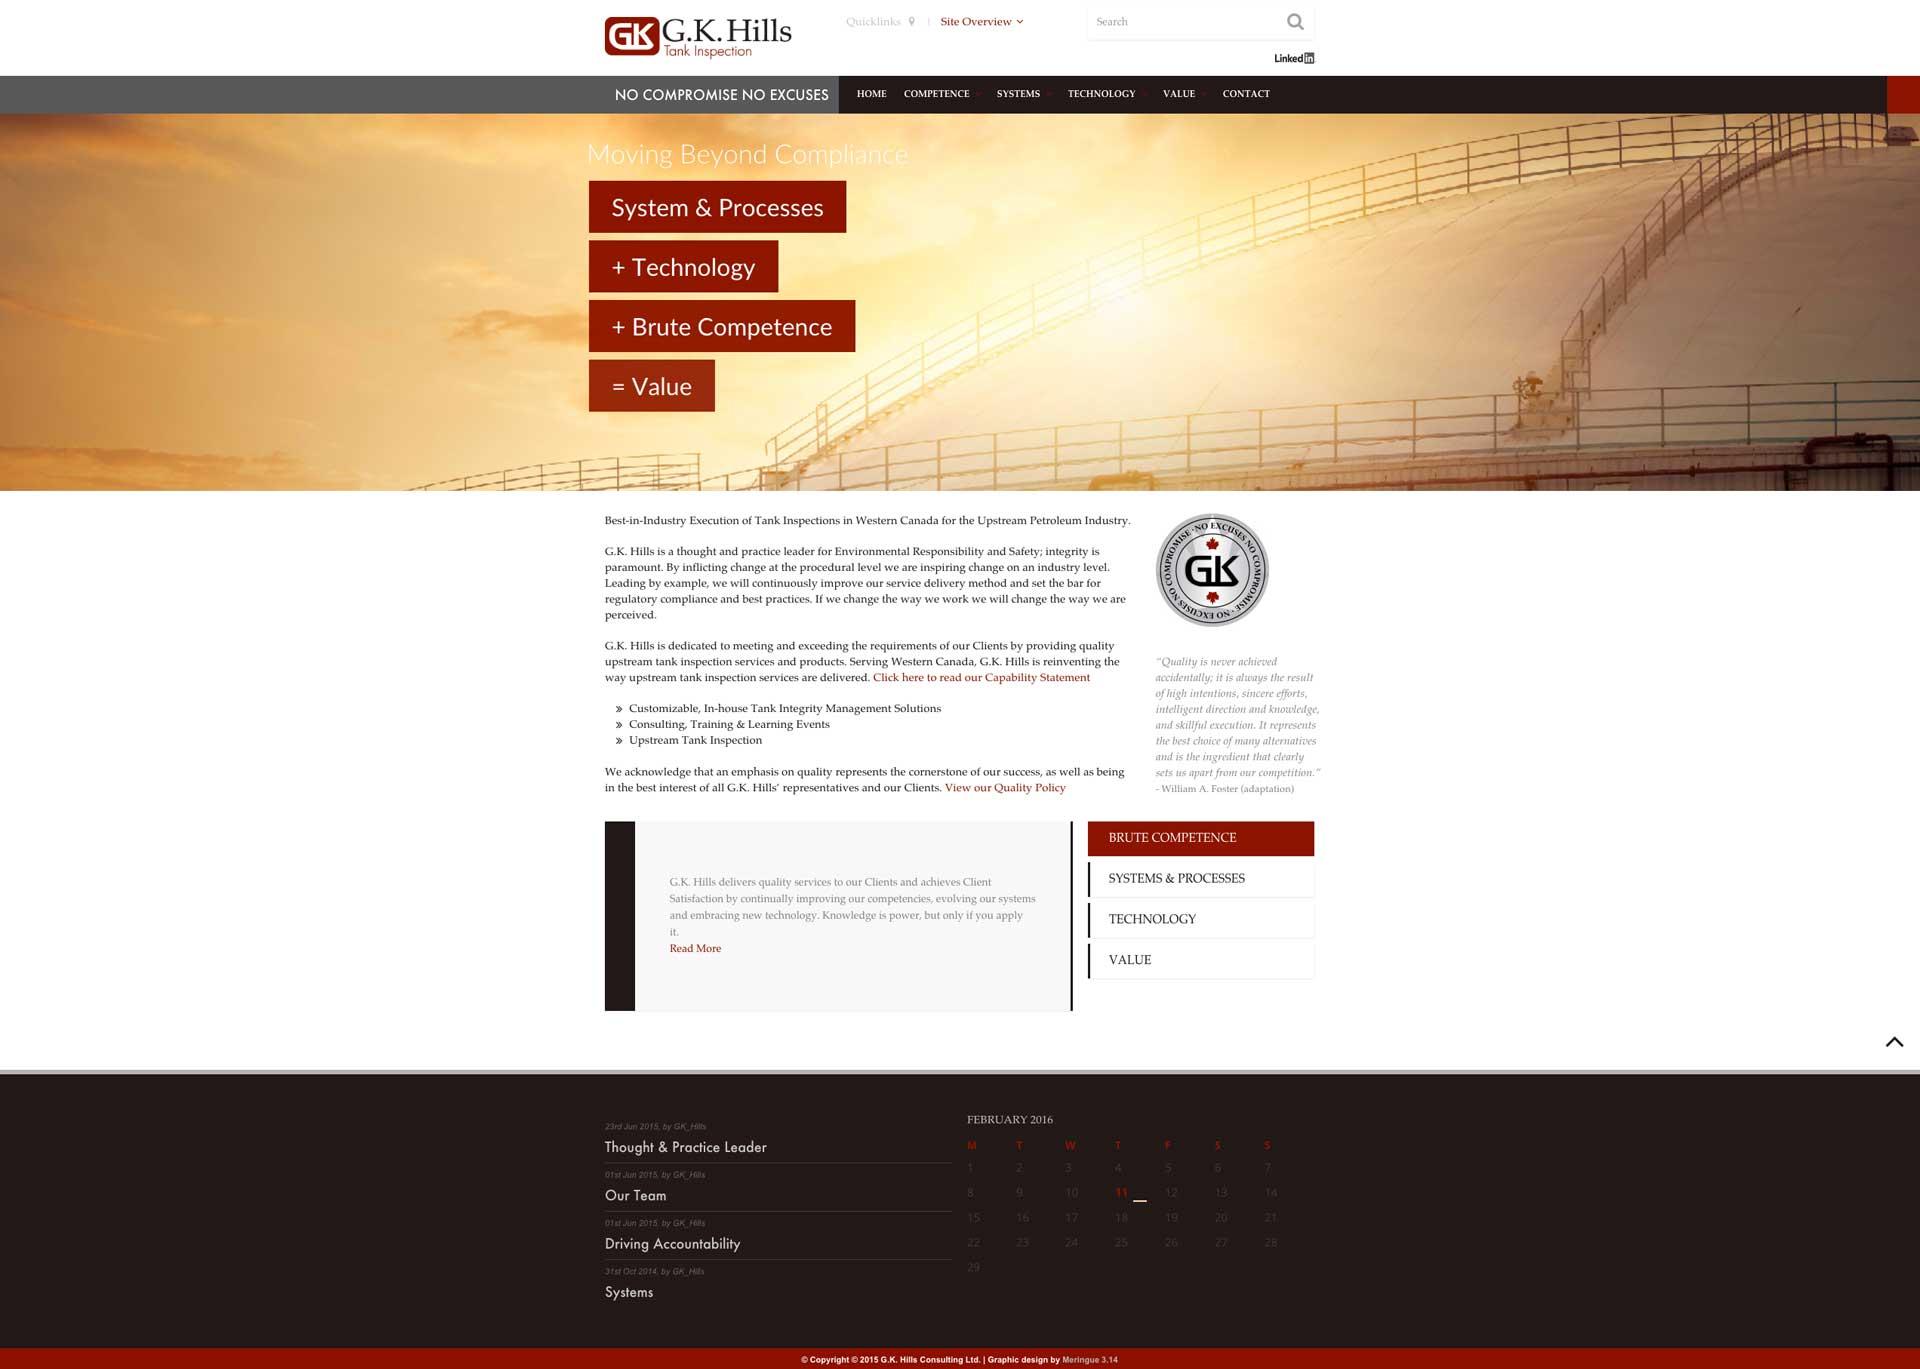 GK Hills Website